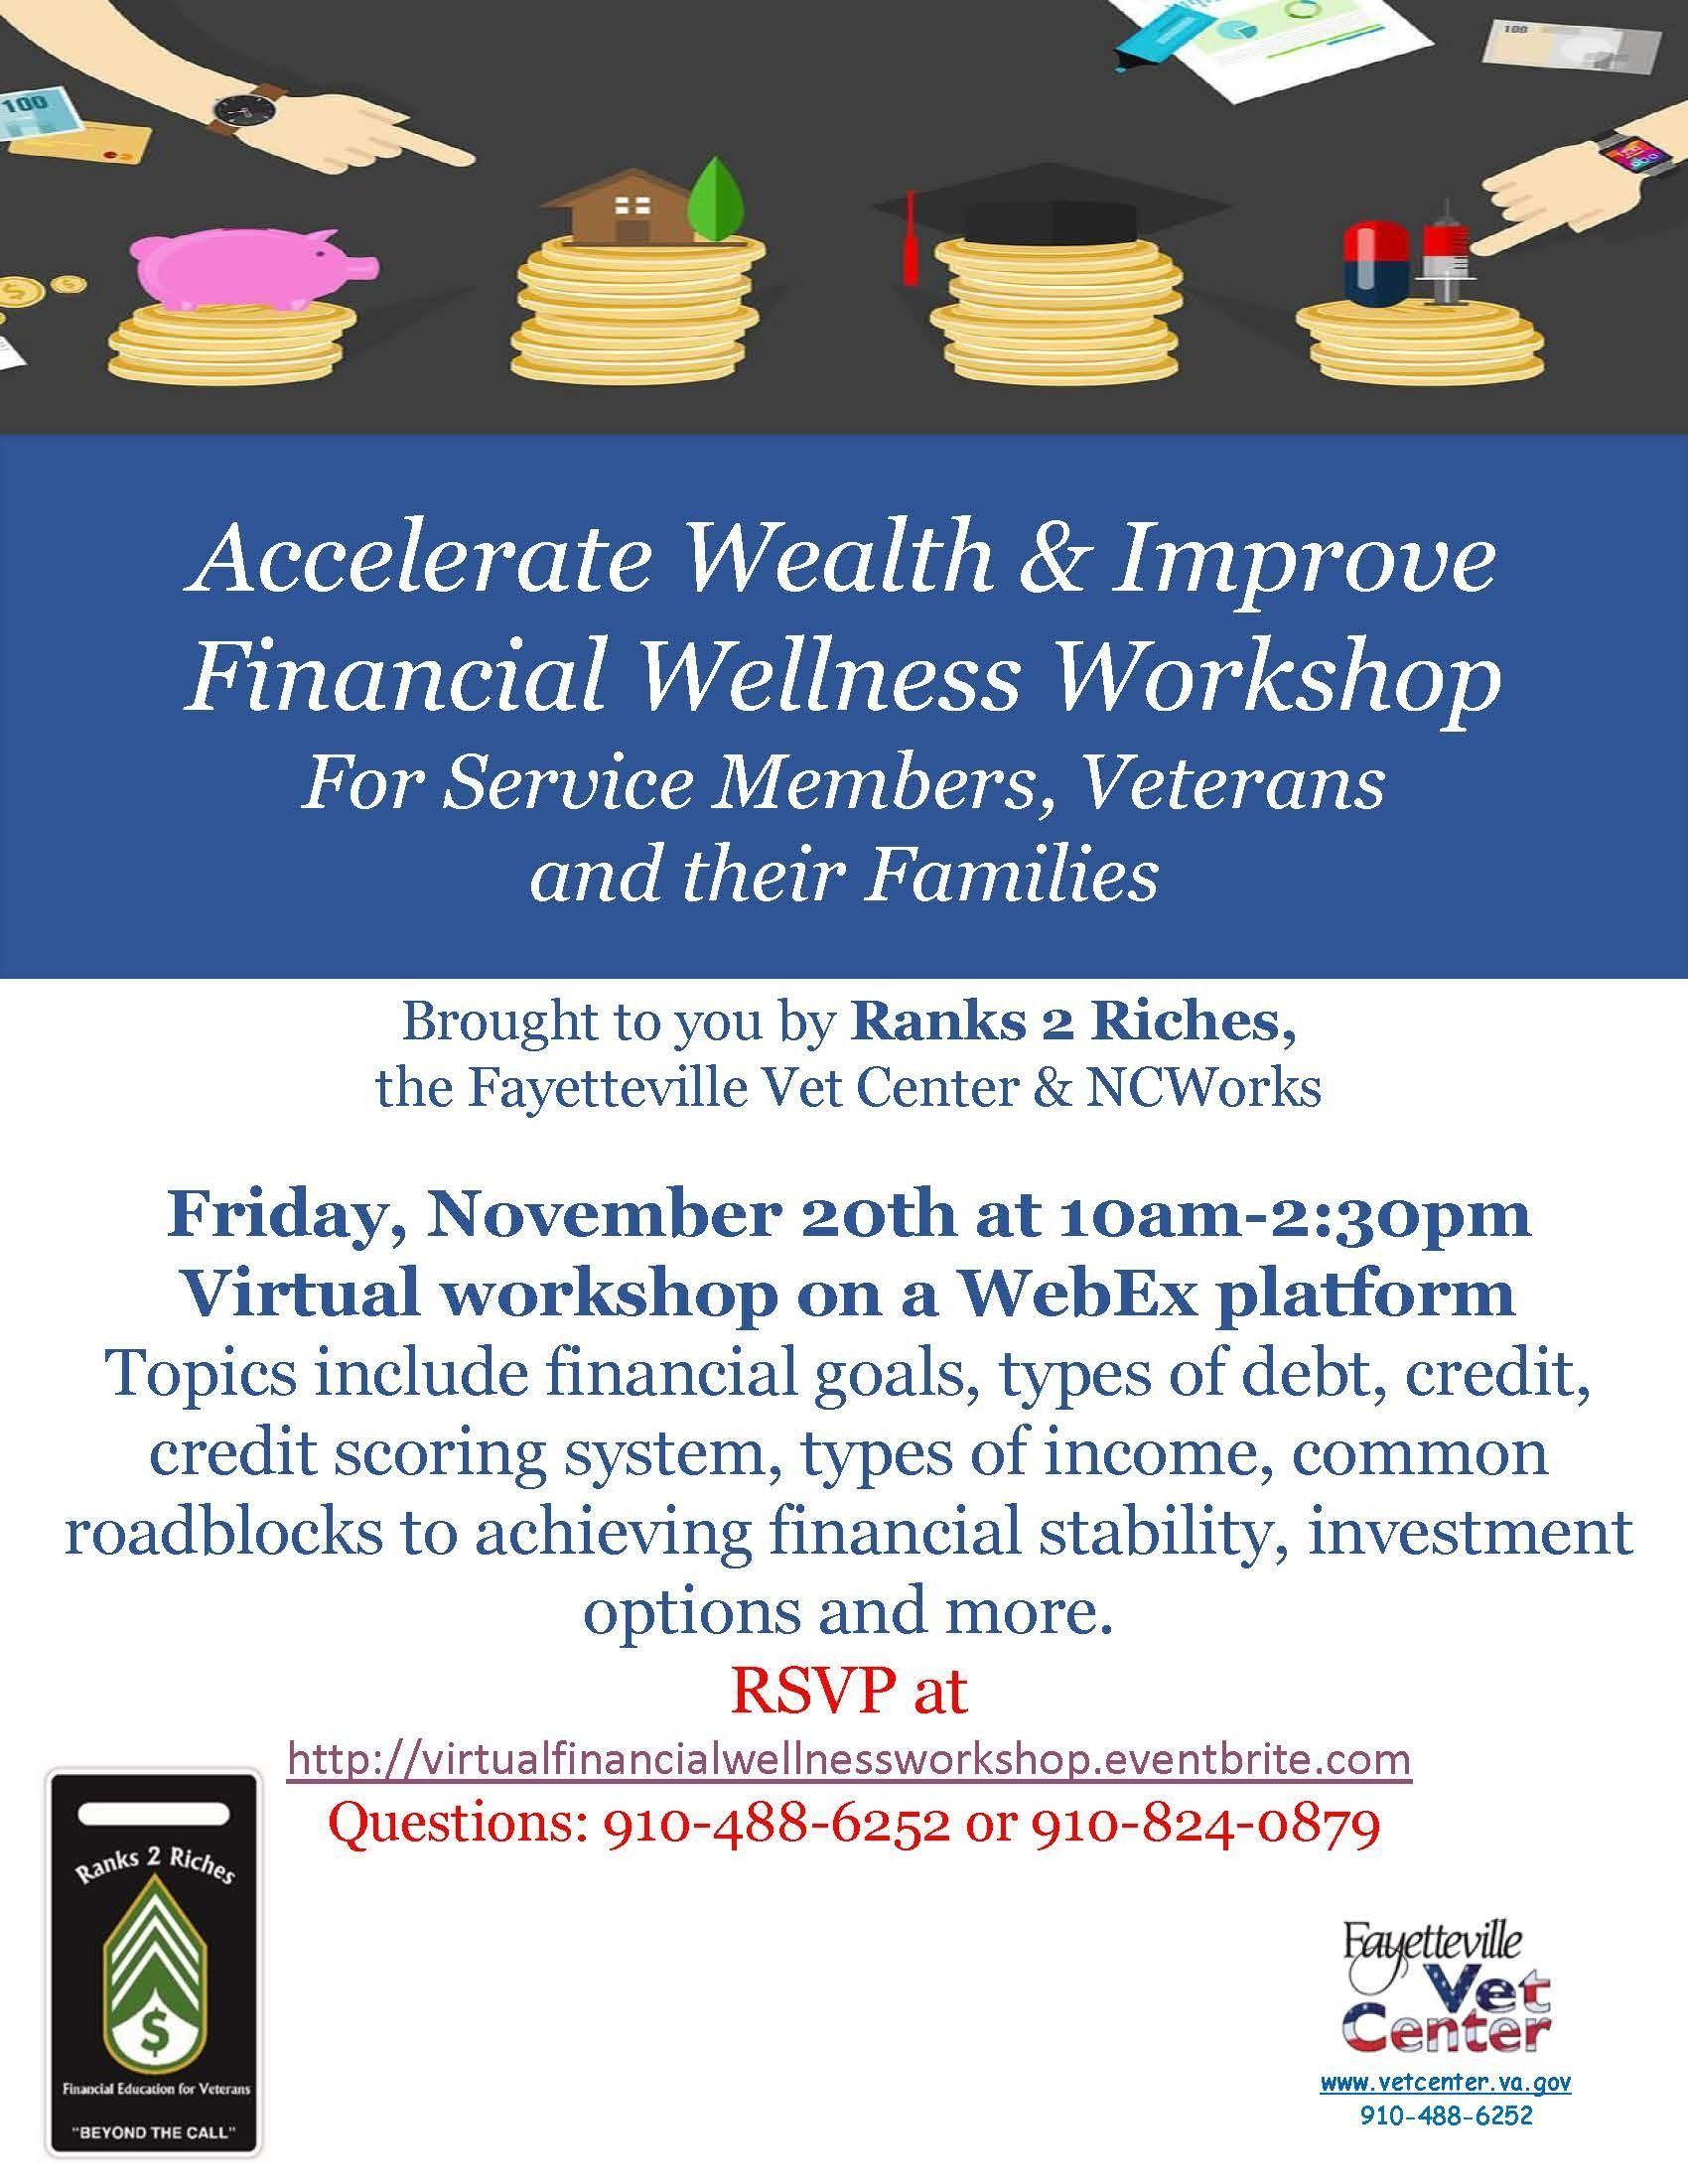 Accelerate Wealth & Improve Financial Wellness Workshop